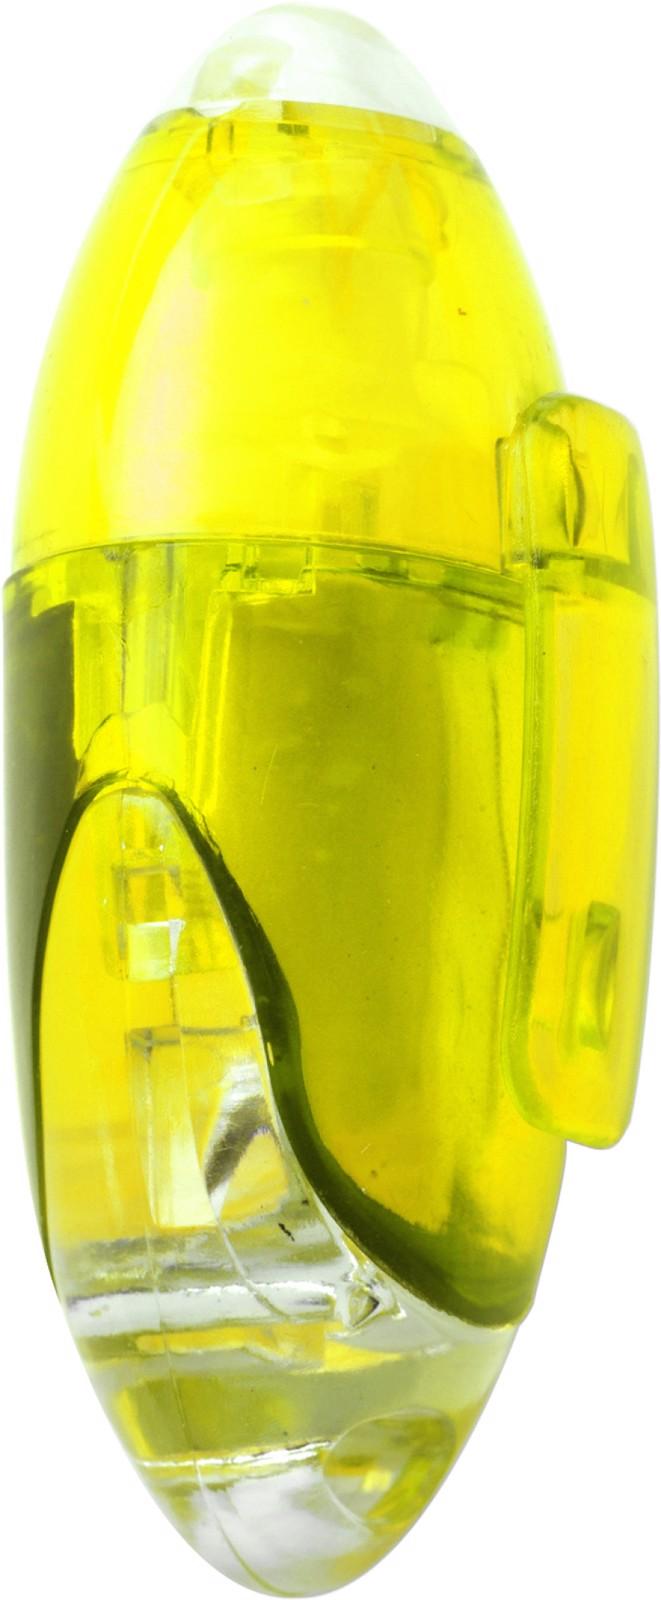 AS text highlighter - Yellow